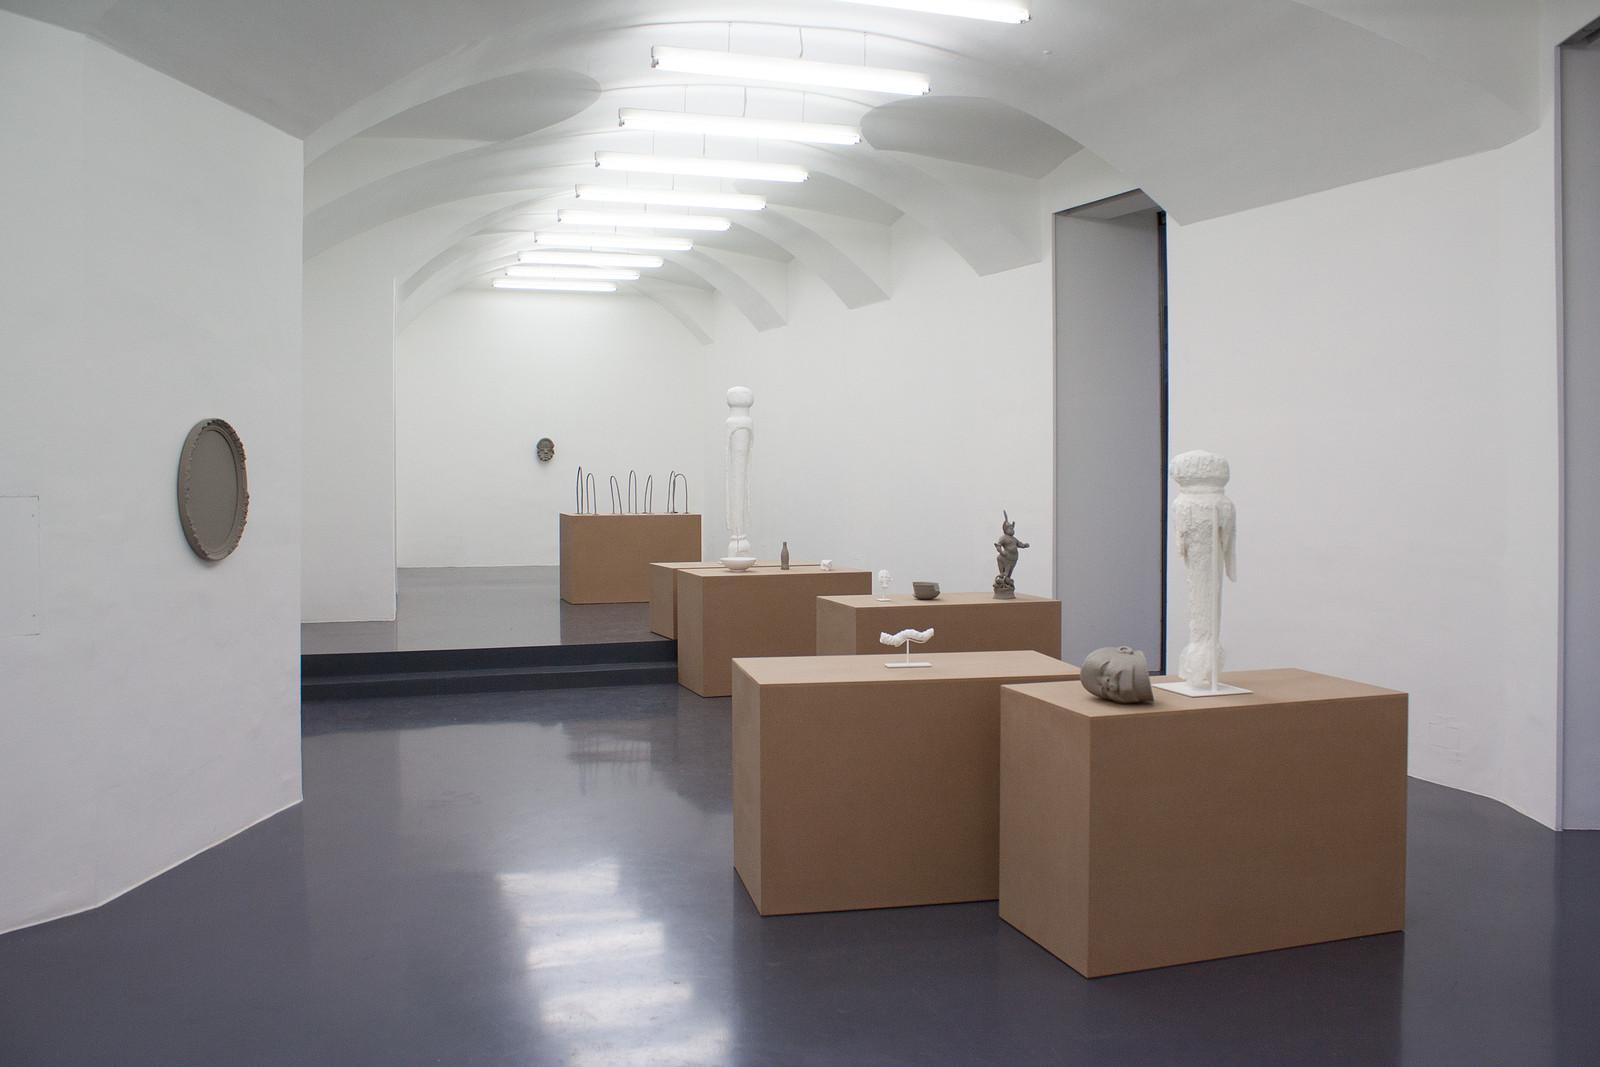 34 Gaylen Gerber exhibition Galerie Emanuel Layr Wien 2016 IMG_8400